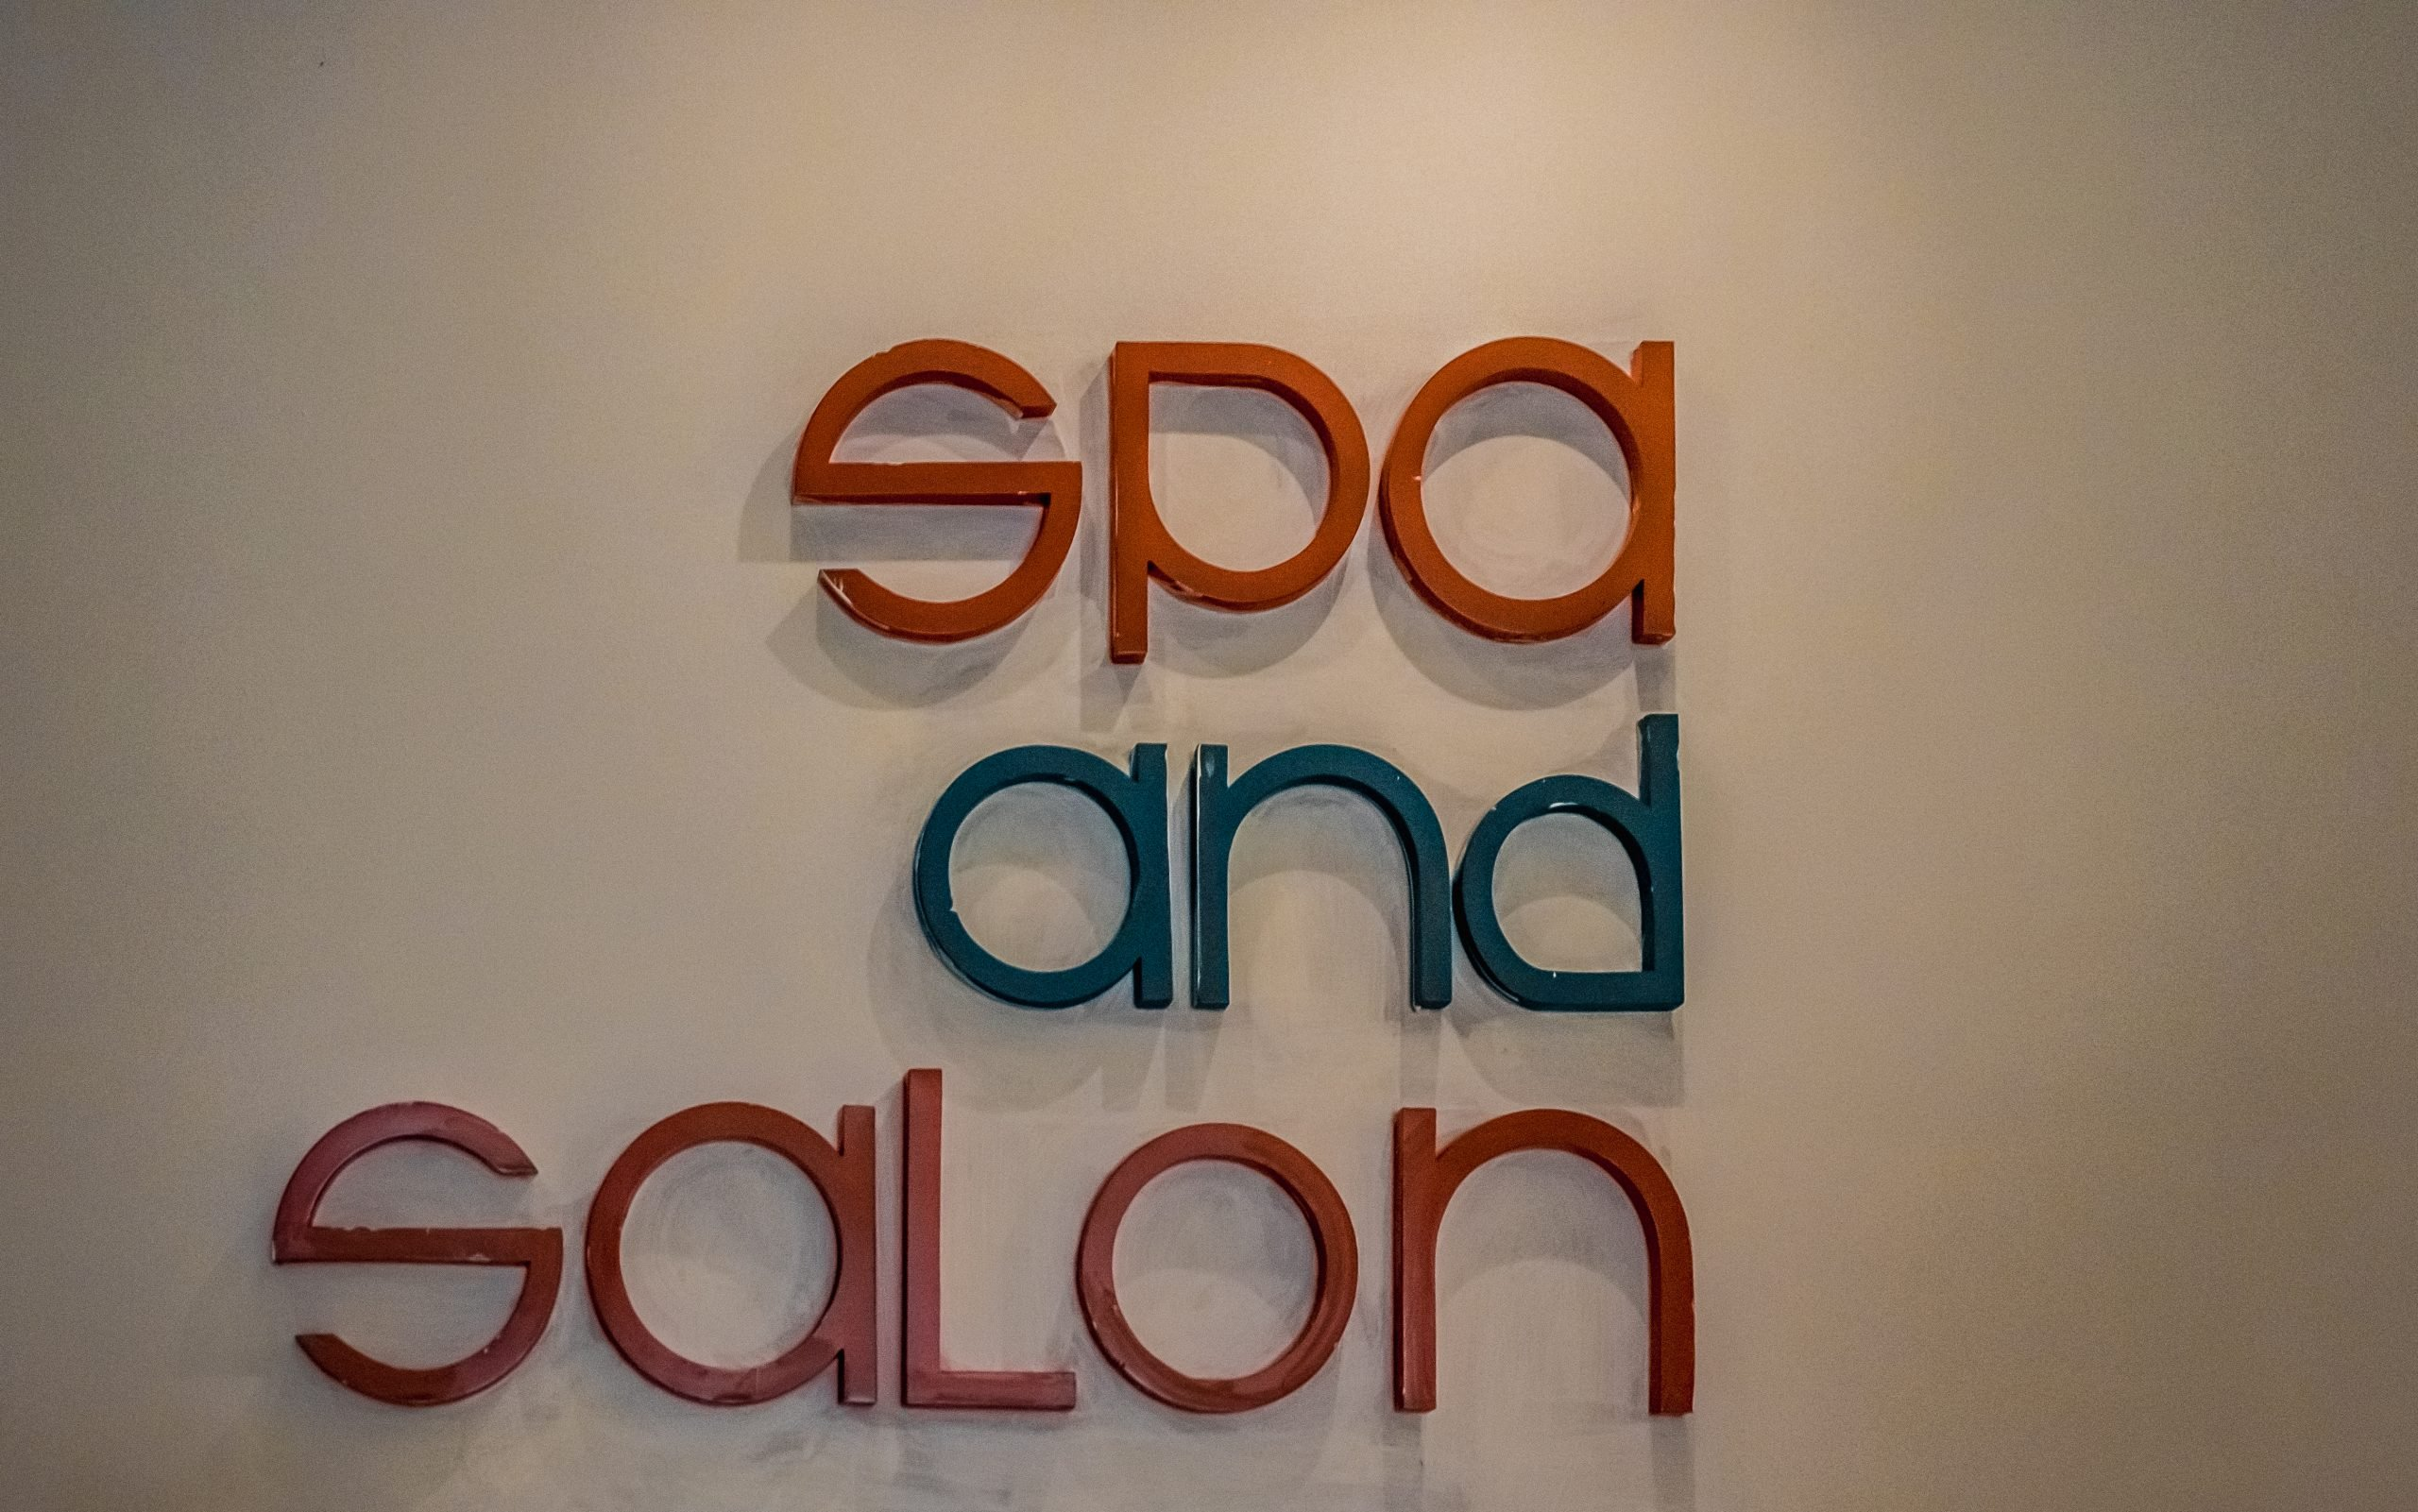 Spa and salon written